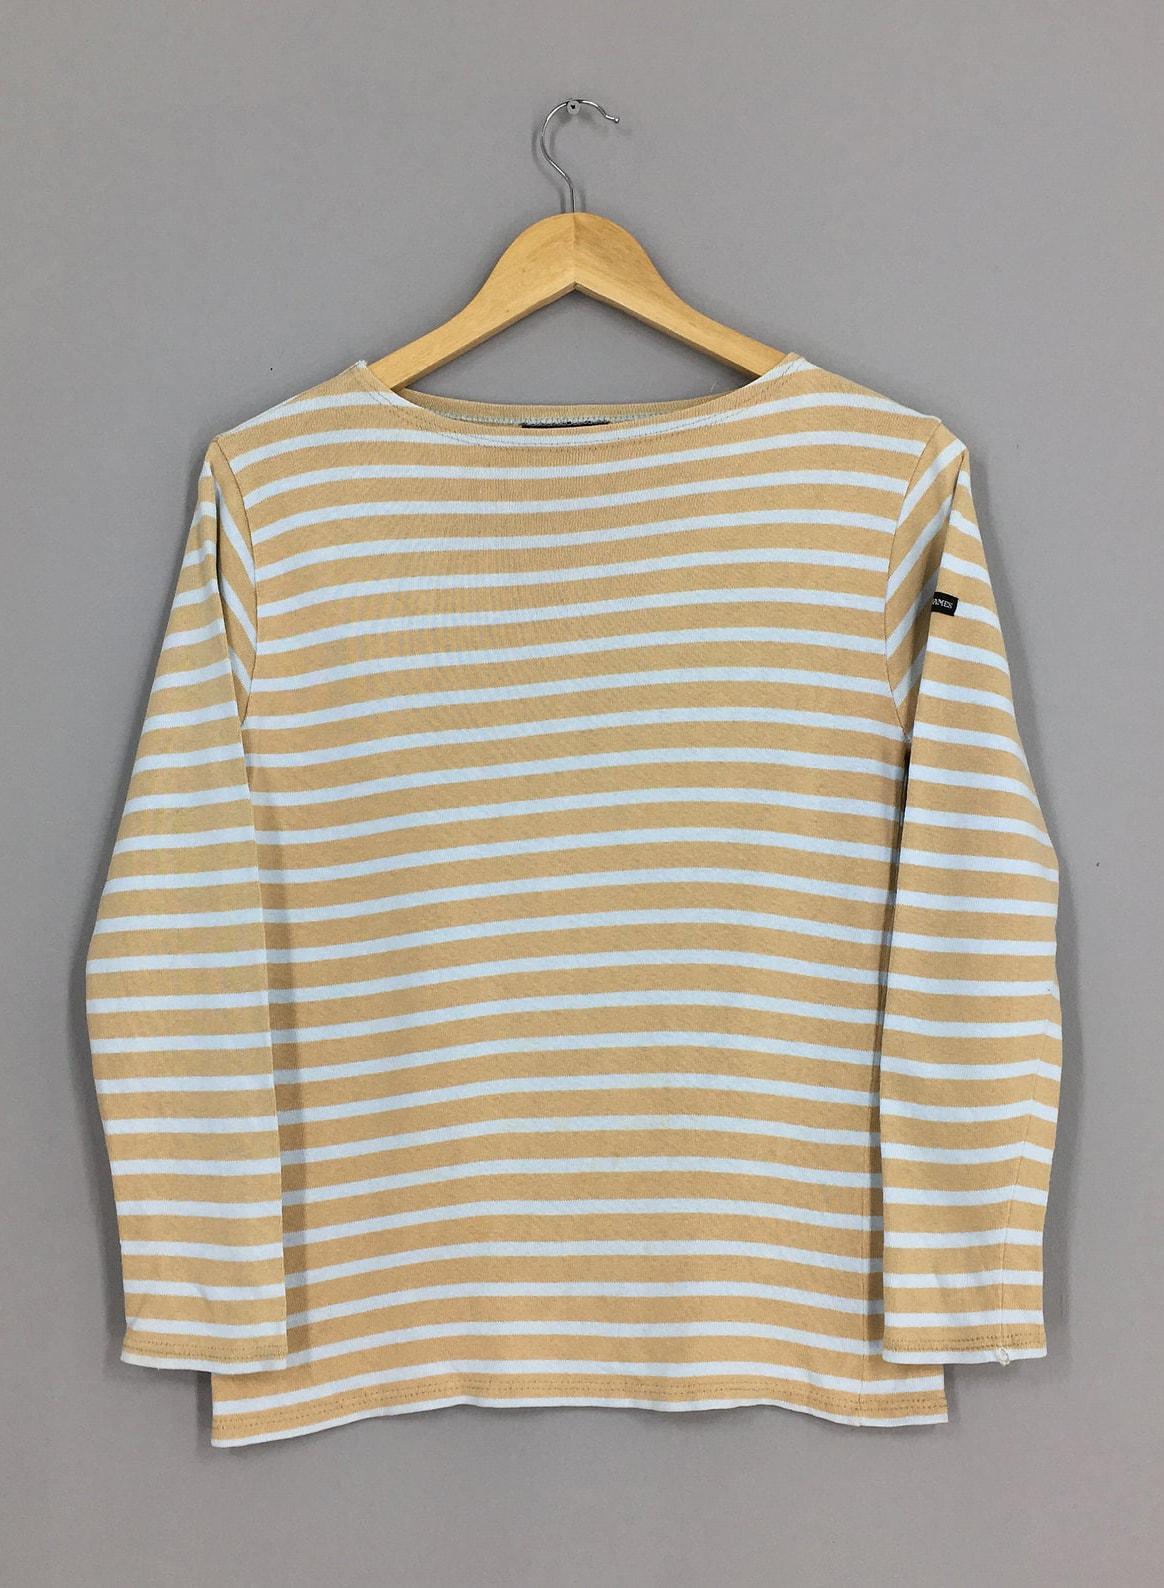 Vintage Saint James Jail Women Stripes Tshirt Small Border Striped Brown White Stripes Ladies Longsleeve Tshirt Size S